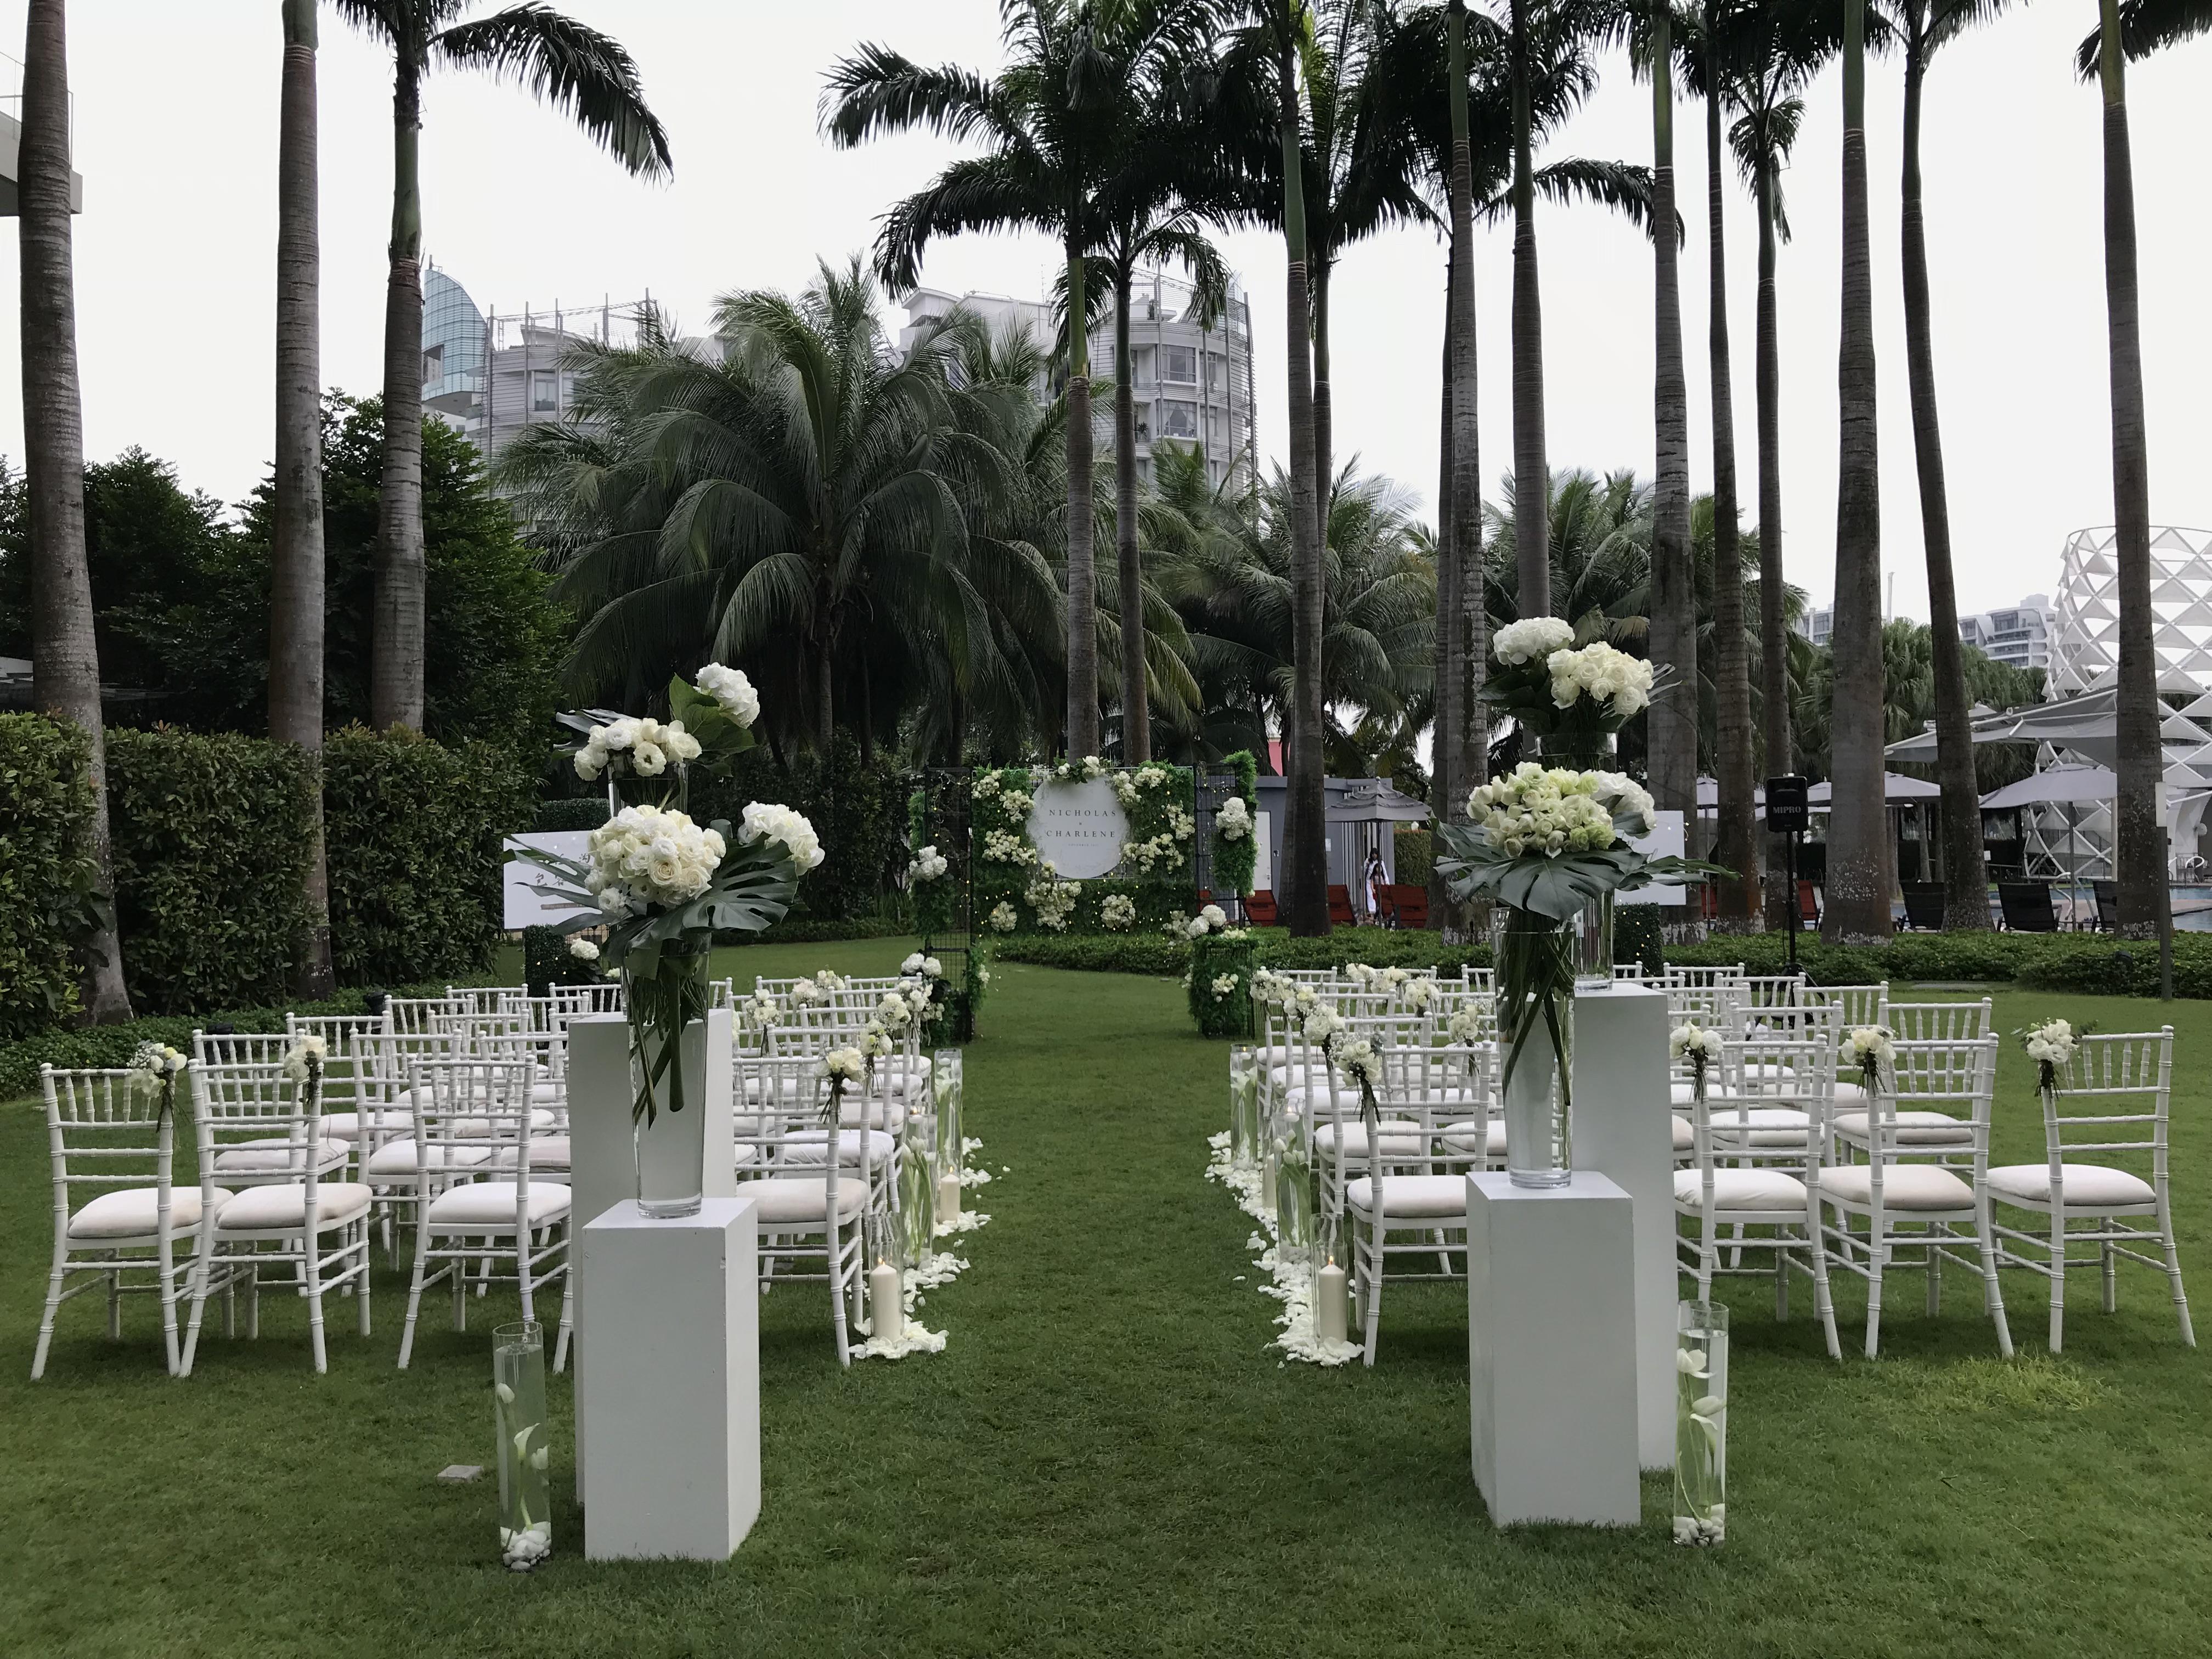 Floratorie - Singapore Online Florist | Flower Delivery | Flower Arrangment Workshop | Featured Collections - Wedding